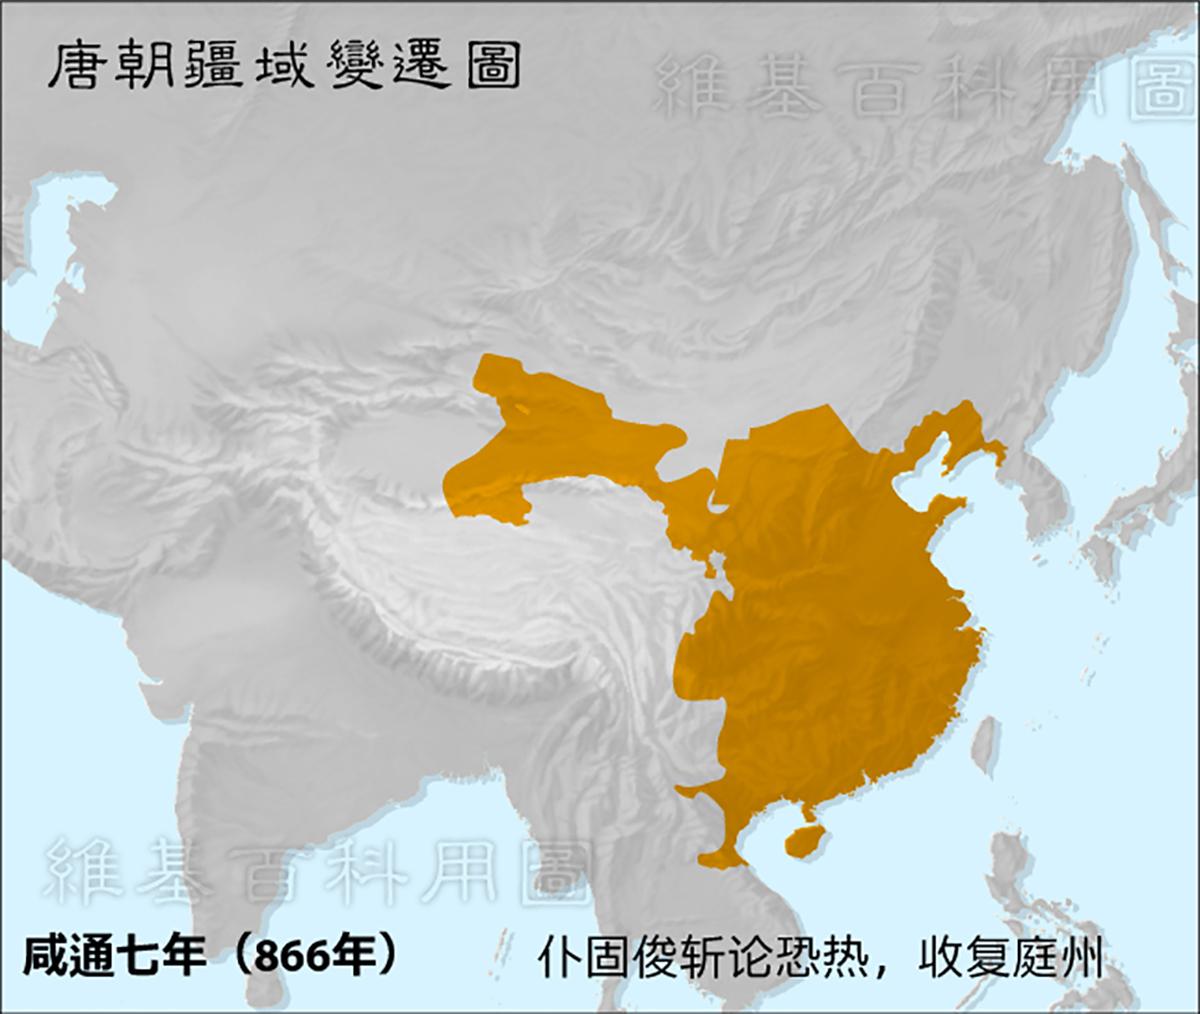 January 24, 901 – Death of Liu Jishu, general of the Tang Dynasty